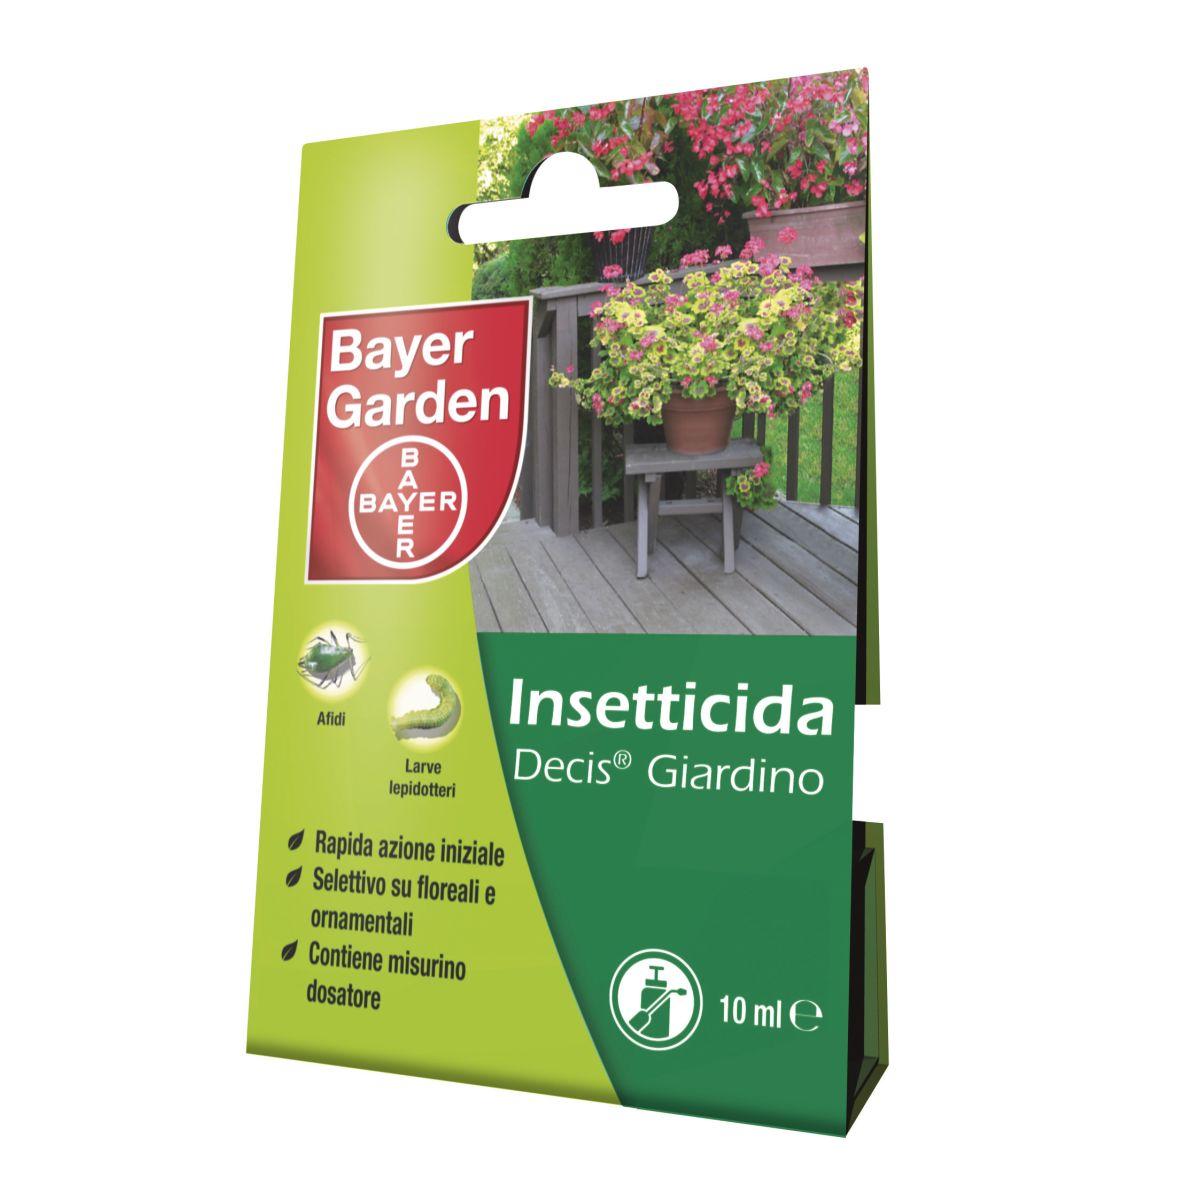 Insetticida decis giardino bayer 10 ml prezzi e offerte for Sdraio leroy merlin